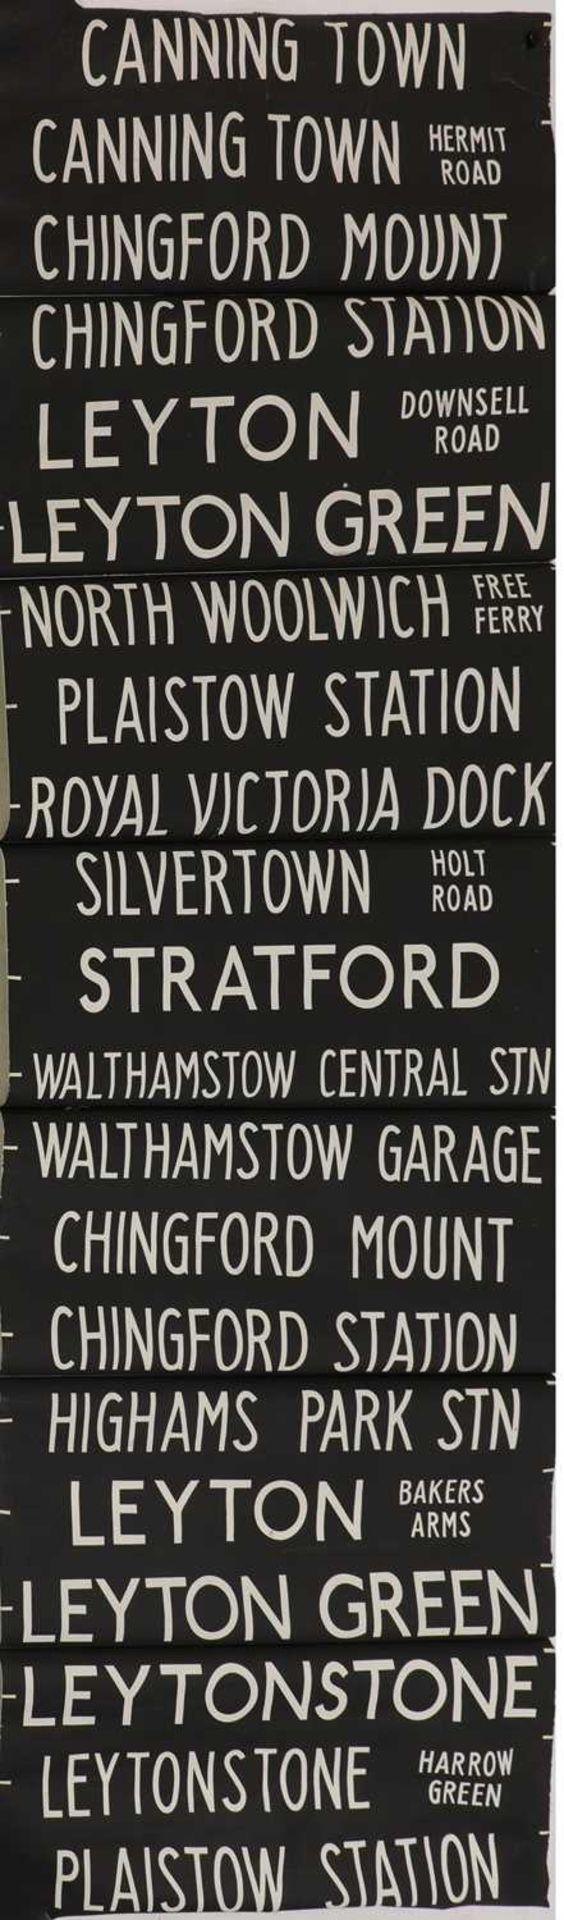 A LARGE LONDON TRANSPORT BUS BLIND,